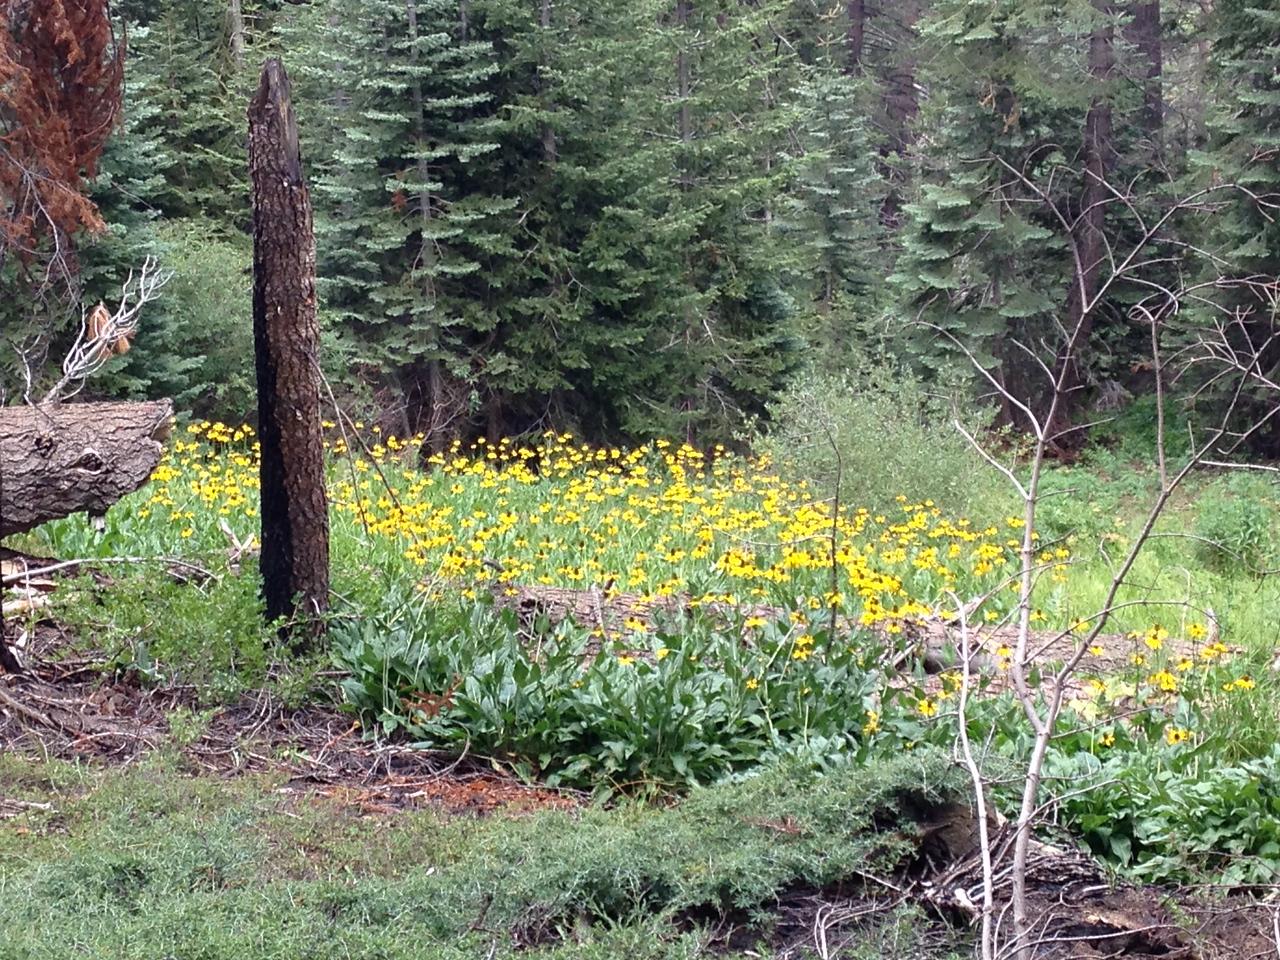 More profuse flowers along the trail, climbing towards Kanawyer Gap.